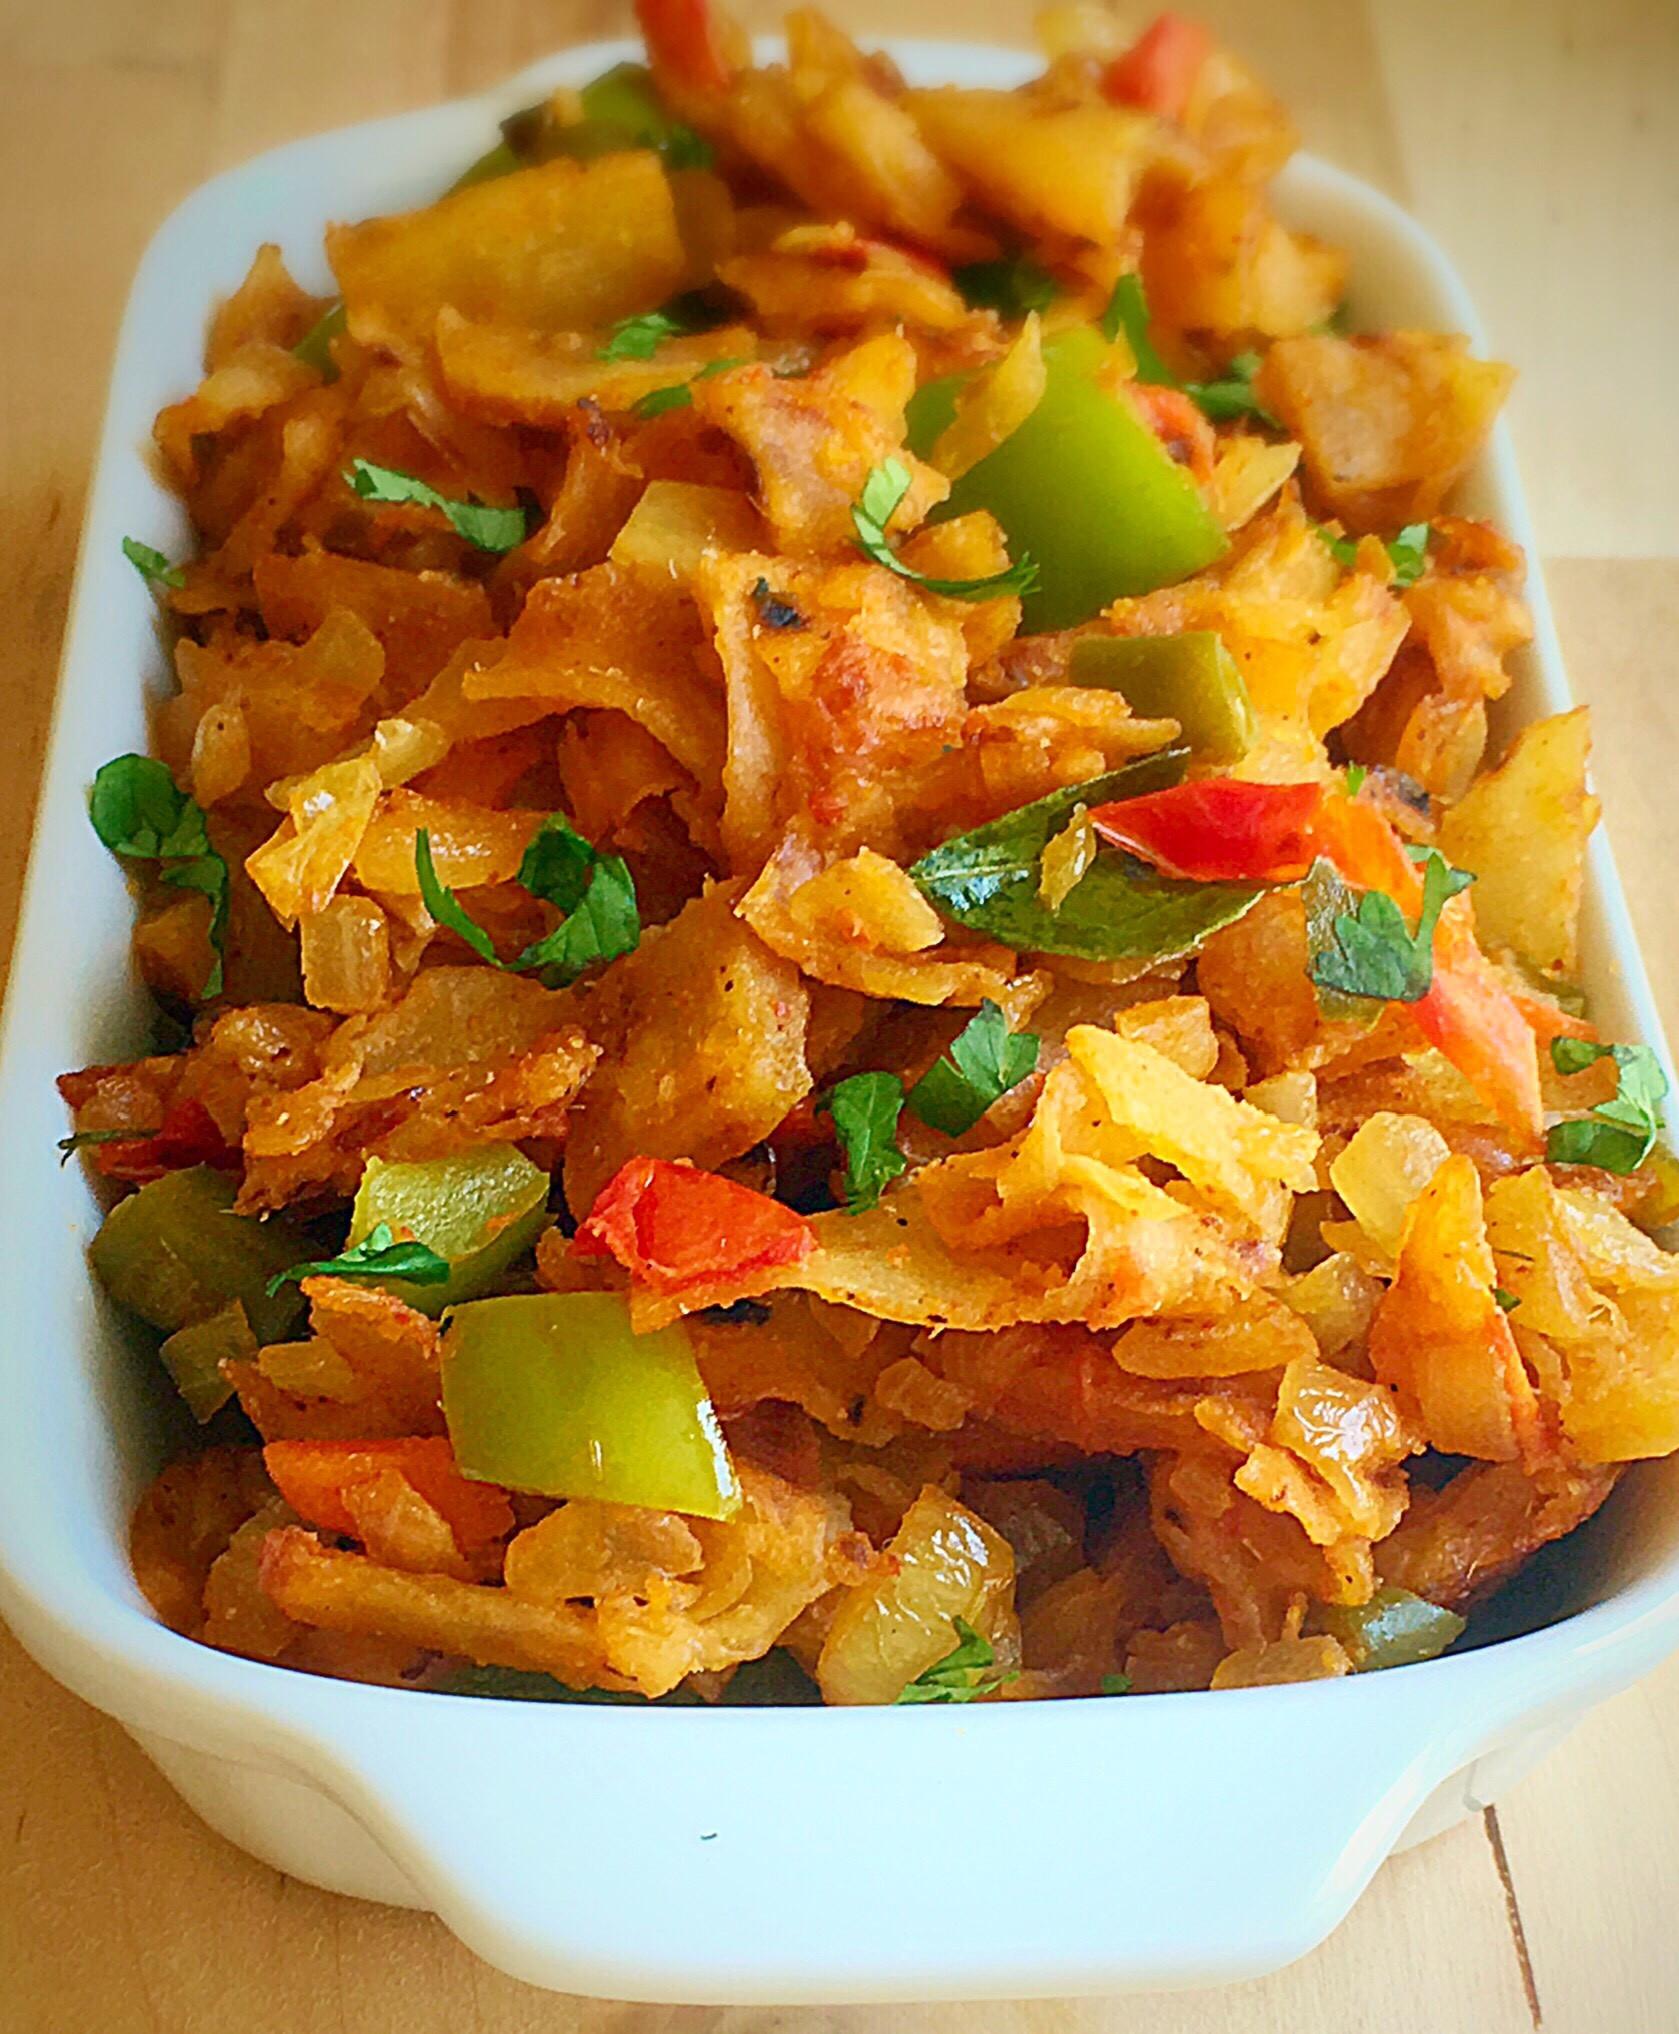 Vegetarian Indian Food Recipes  Veg kothu parotta recipe How to make ve able kothu